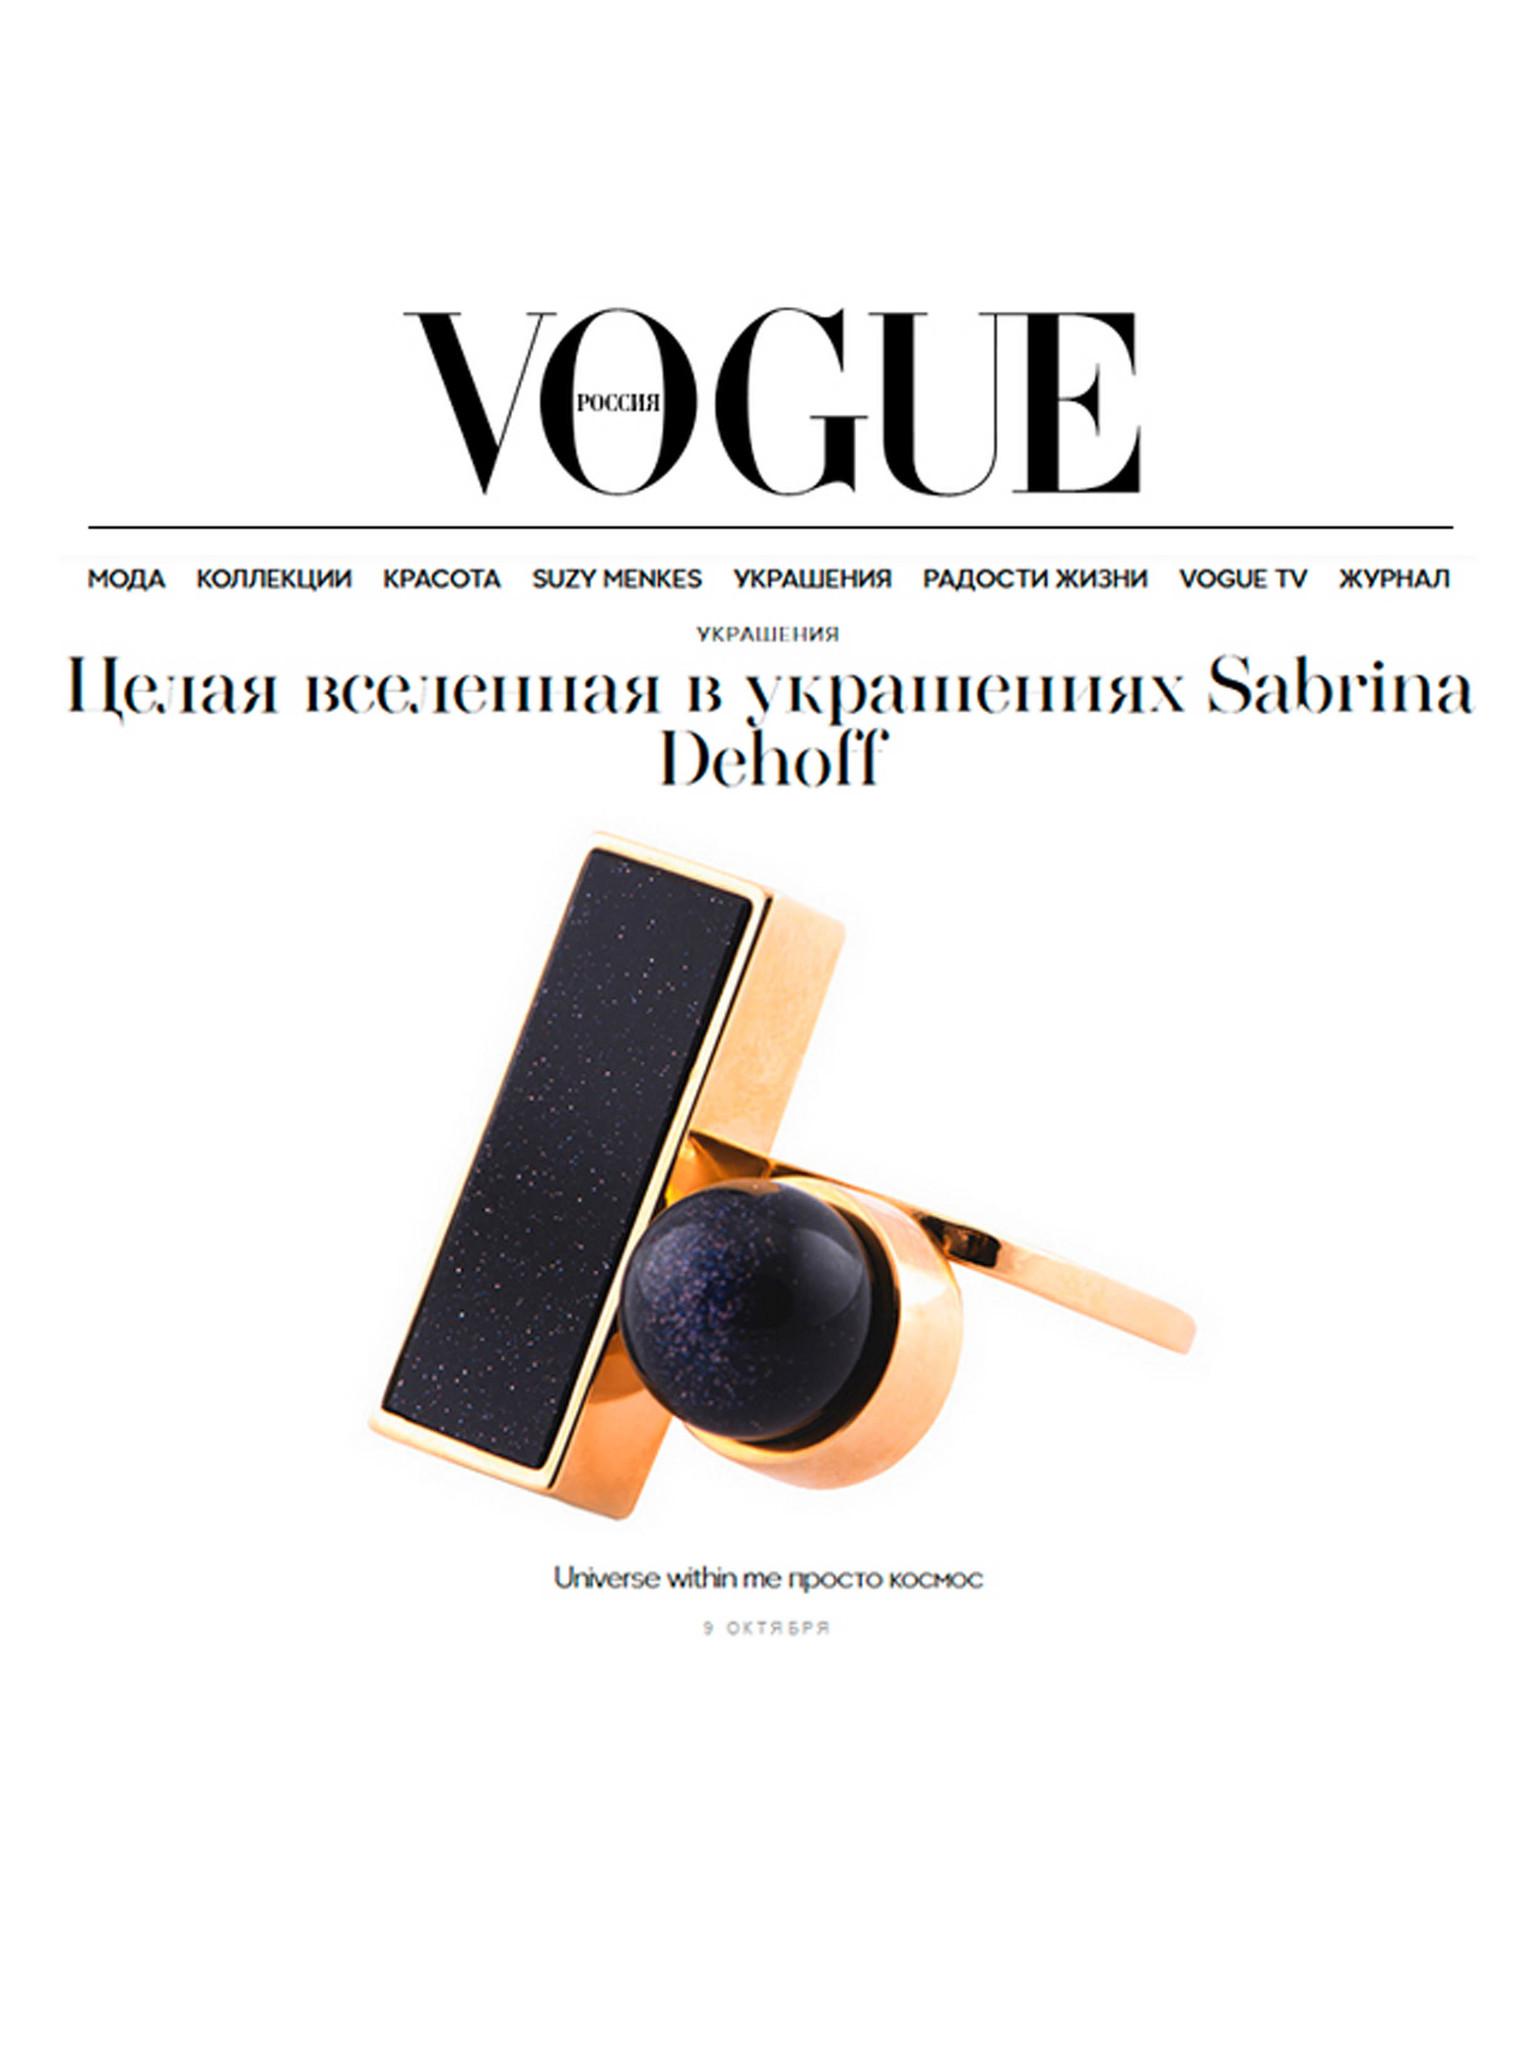 "Коллекция Sabrina Dehoff ""Universe within me"" на сайте Vogue 9 октябрь 2015"